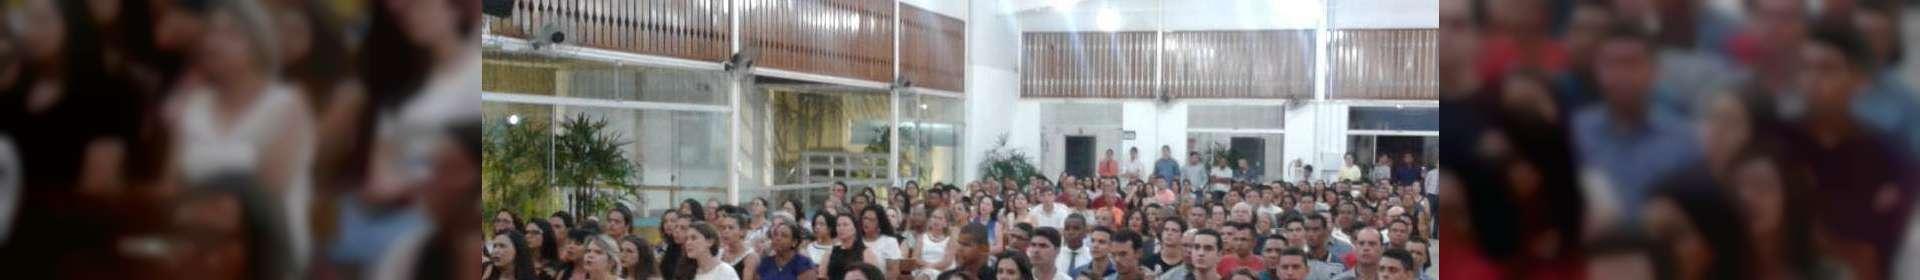 Igrejas Cristã Maranata da Região de Caratinga (MG) participam de culto especial